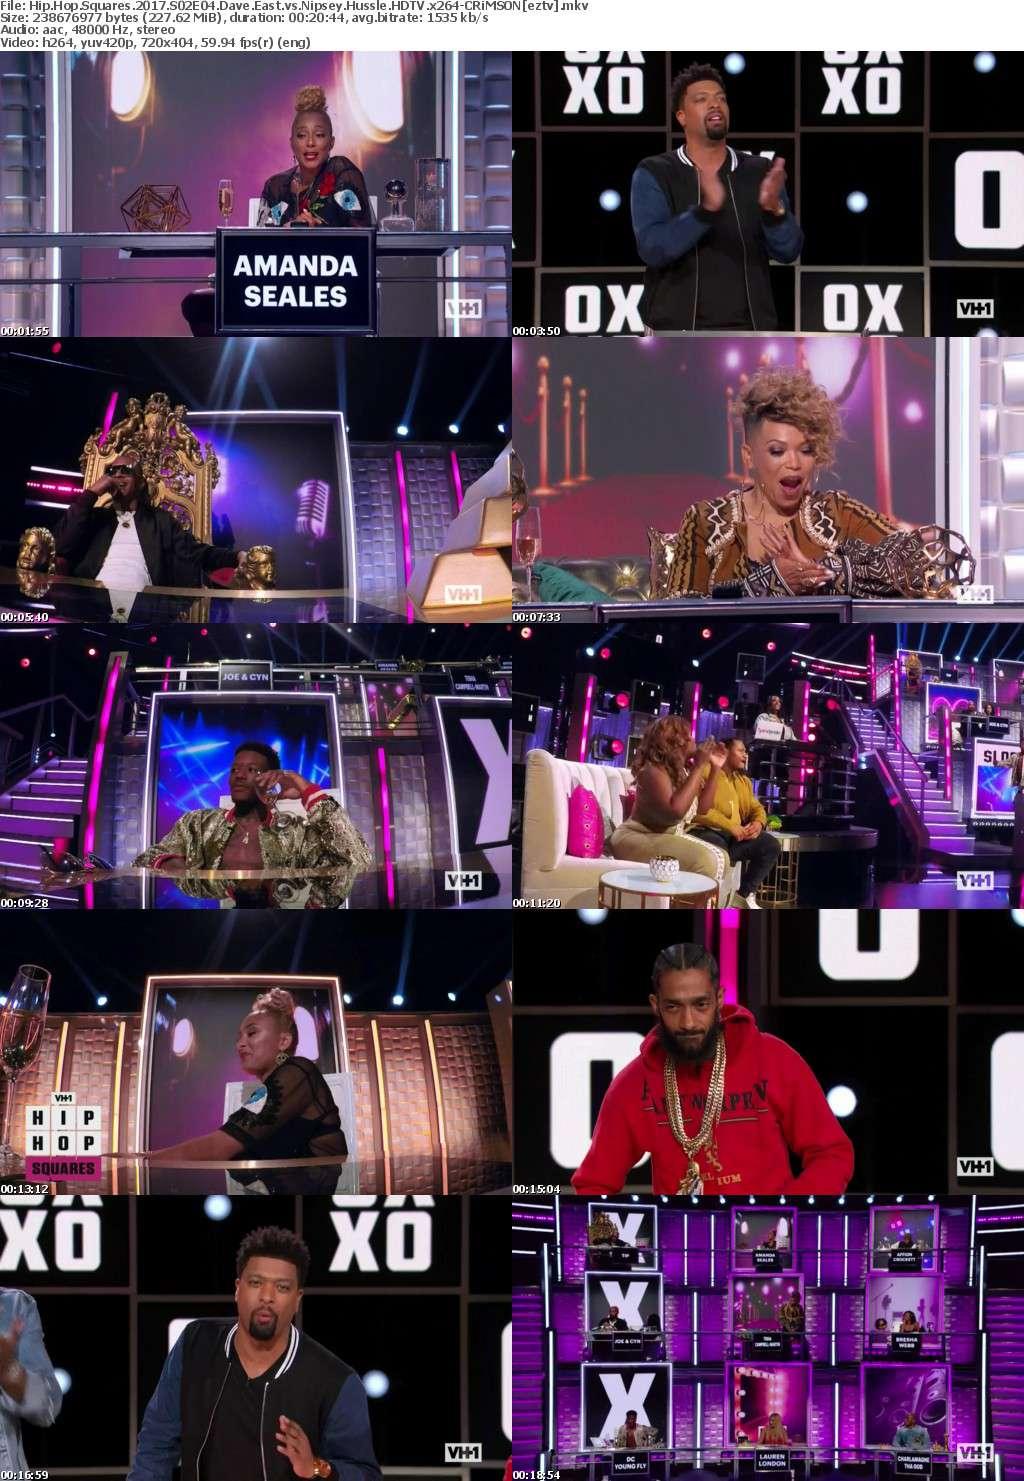 Hip Hop Squares (2017) S02E04 Dave East vs Nipsey Hussle HDTV x264-CRiMSON